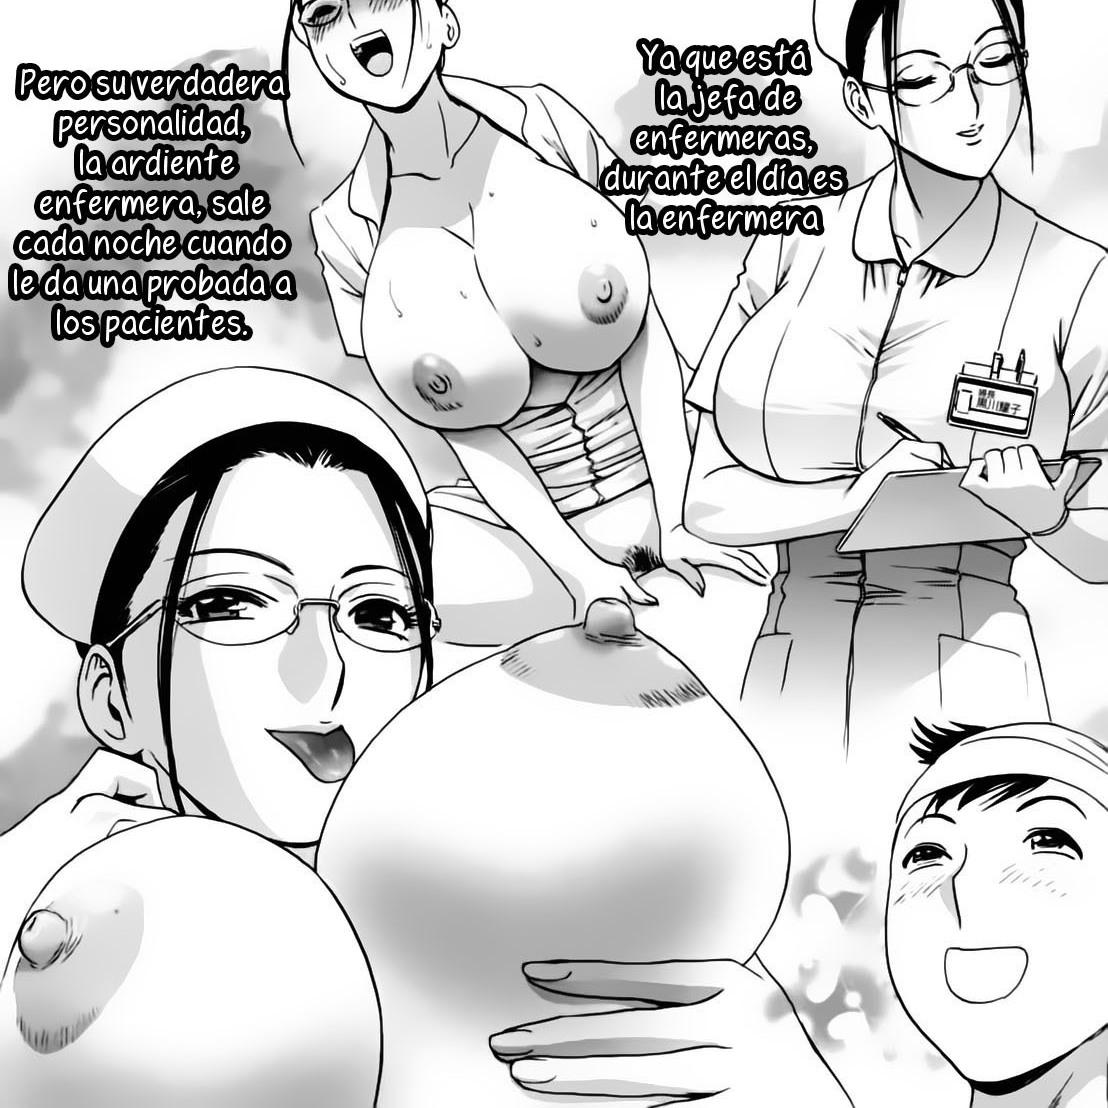 Boing boing onsen 08